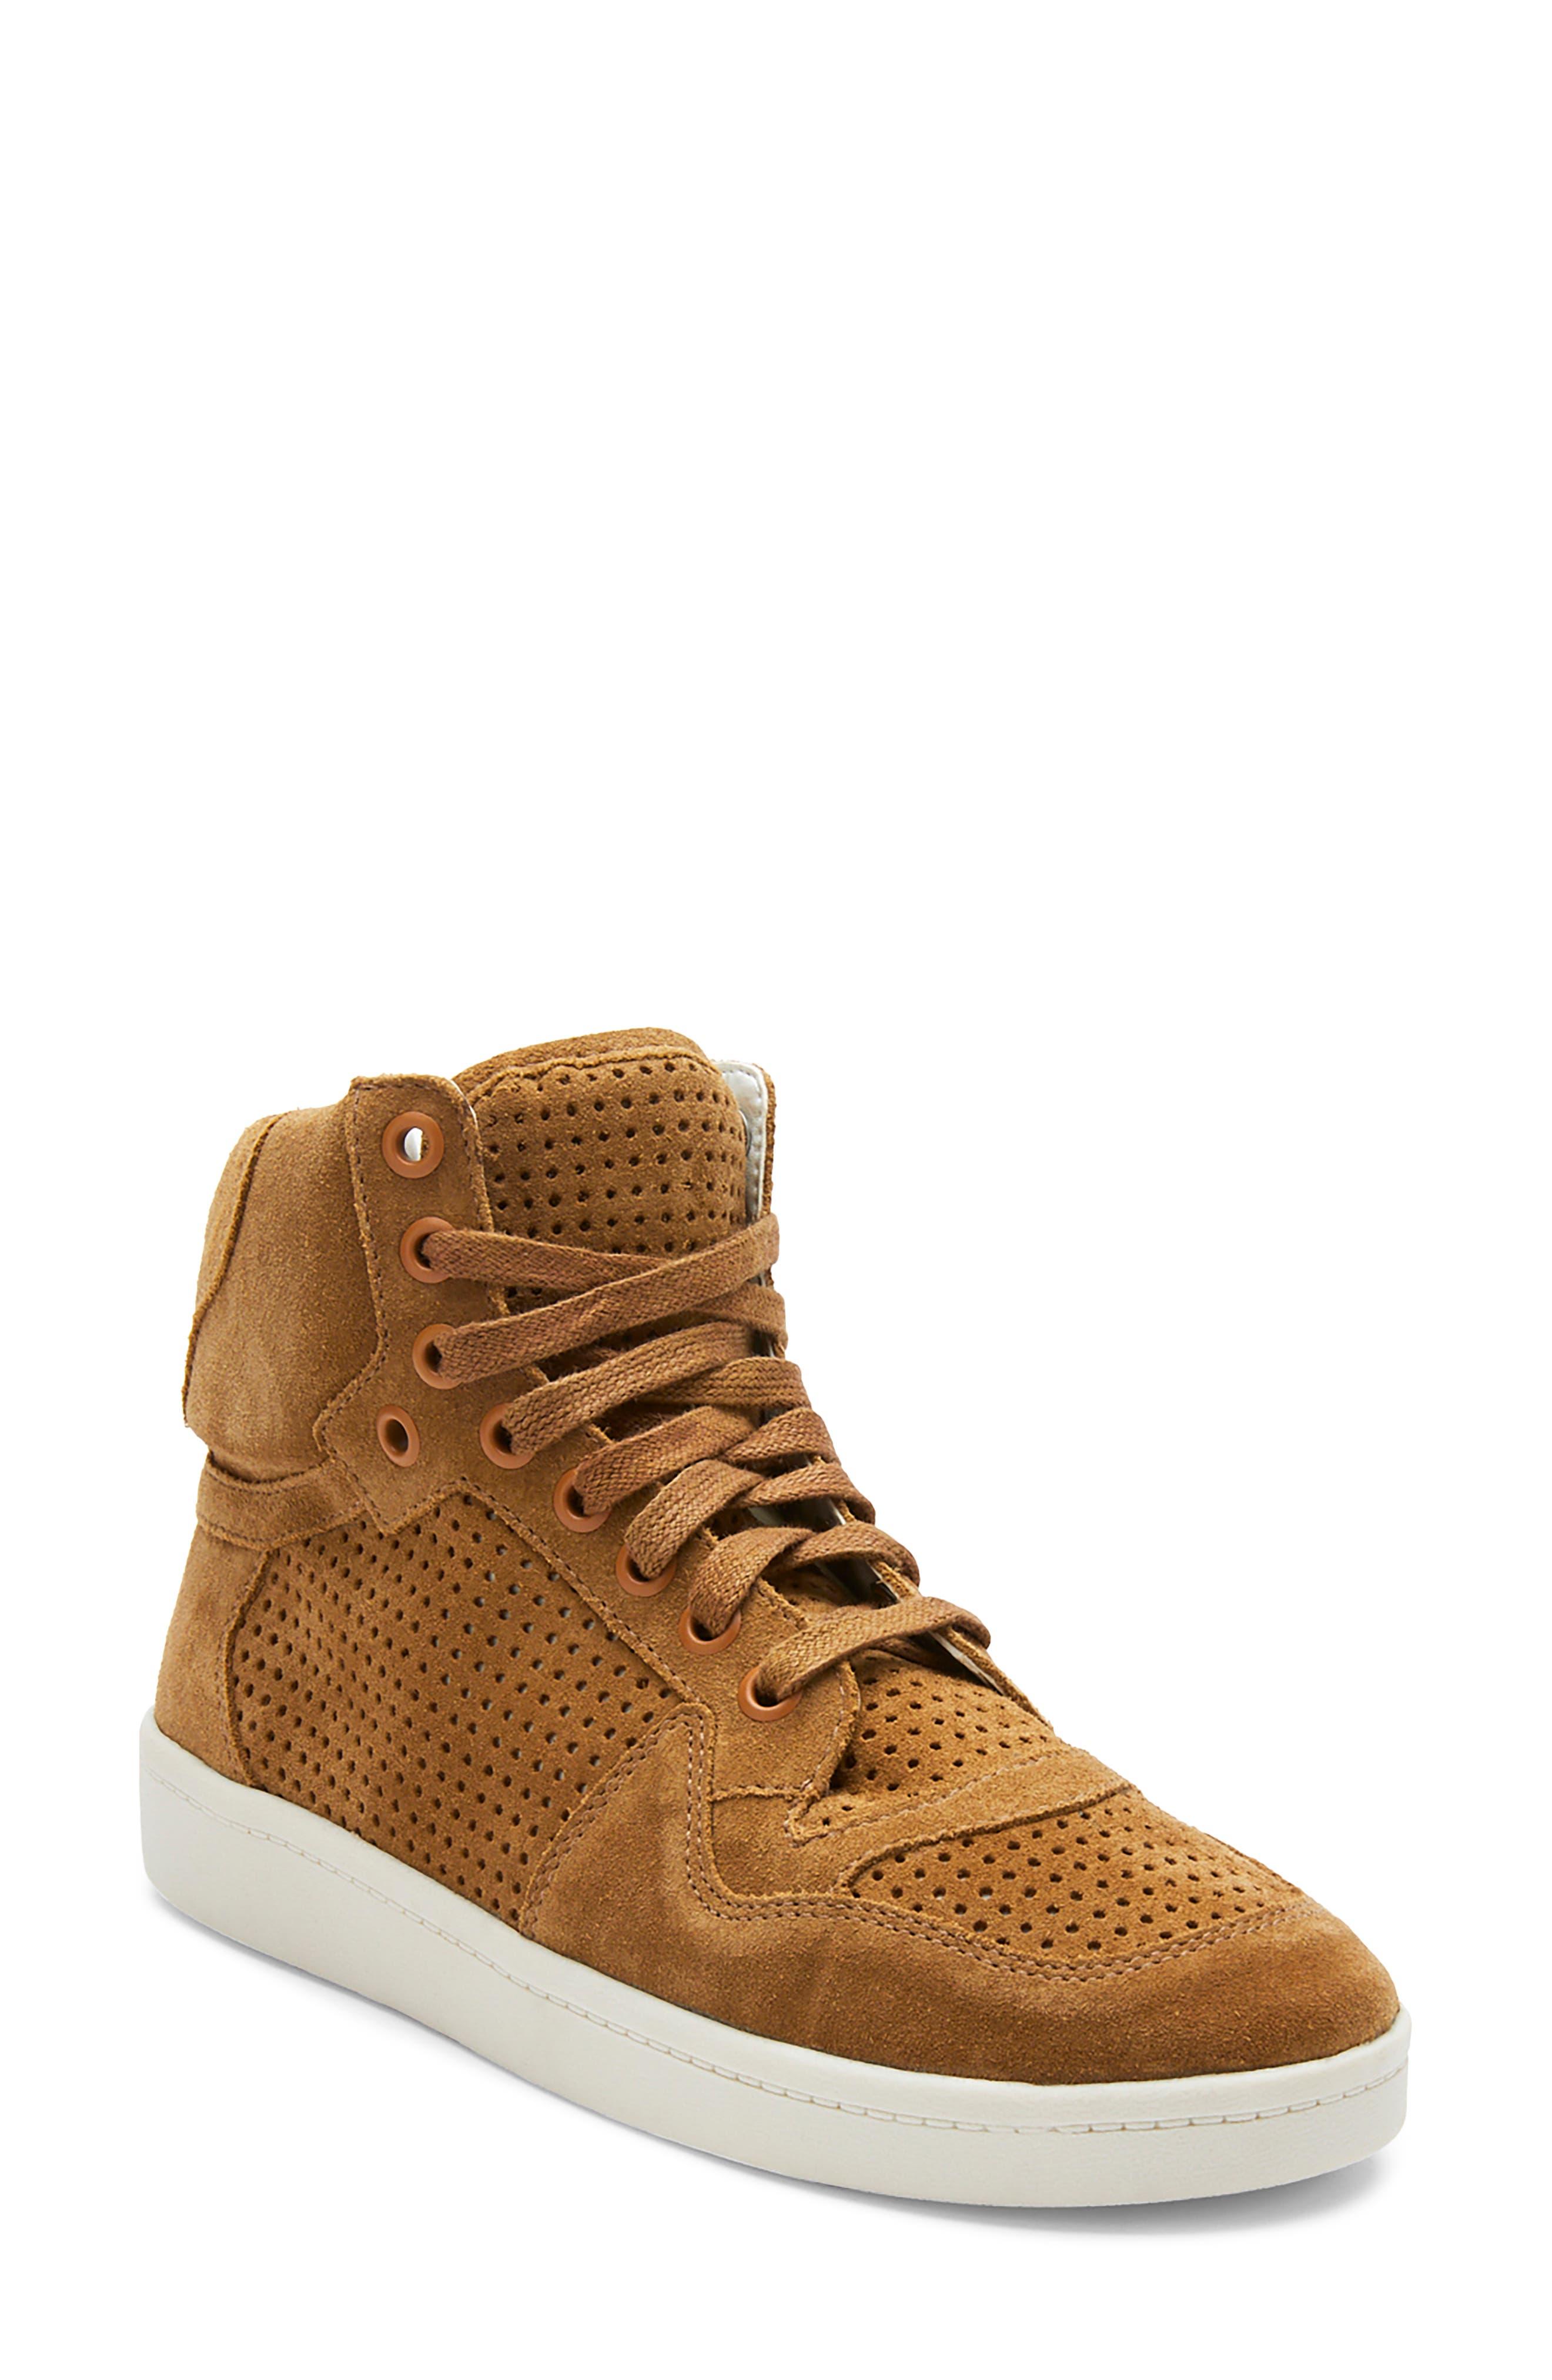 Girl Crush Leather High Top Sneaker